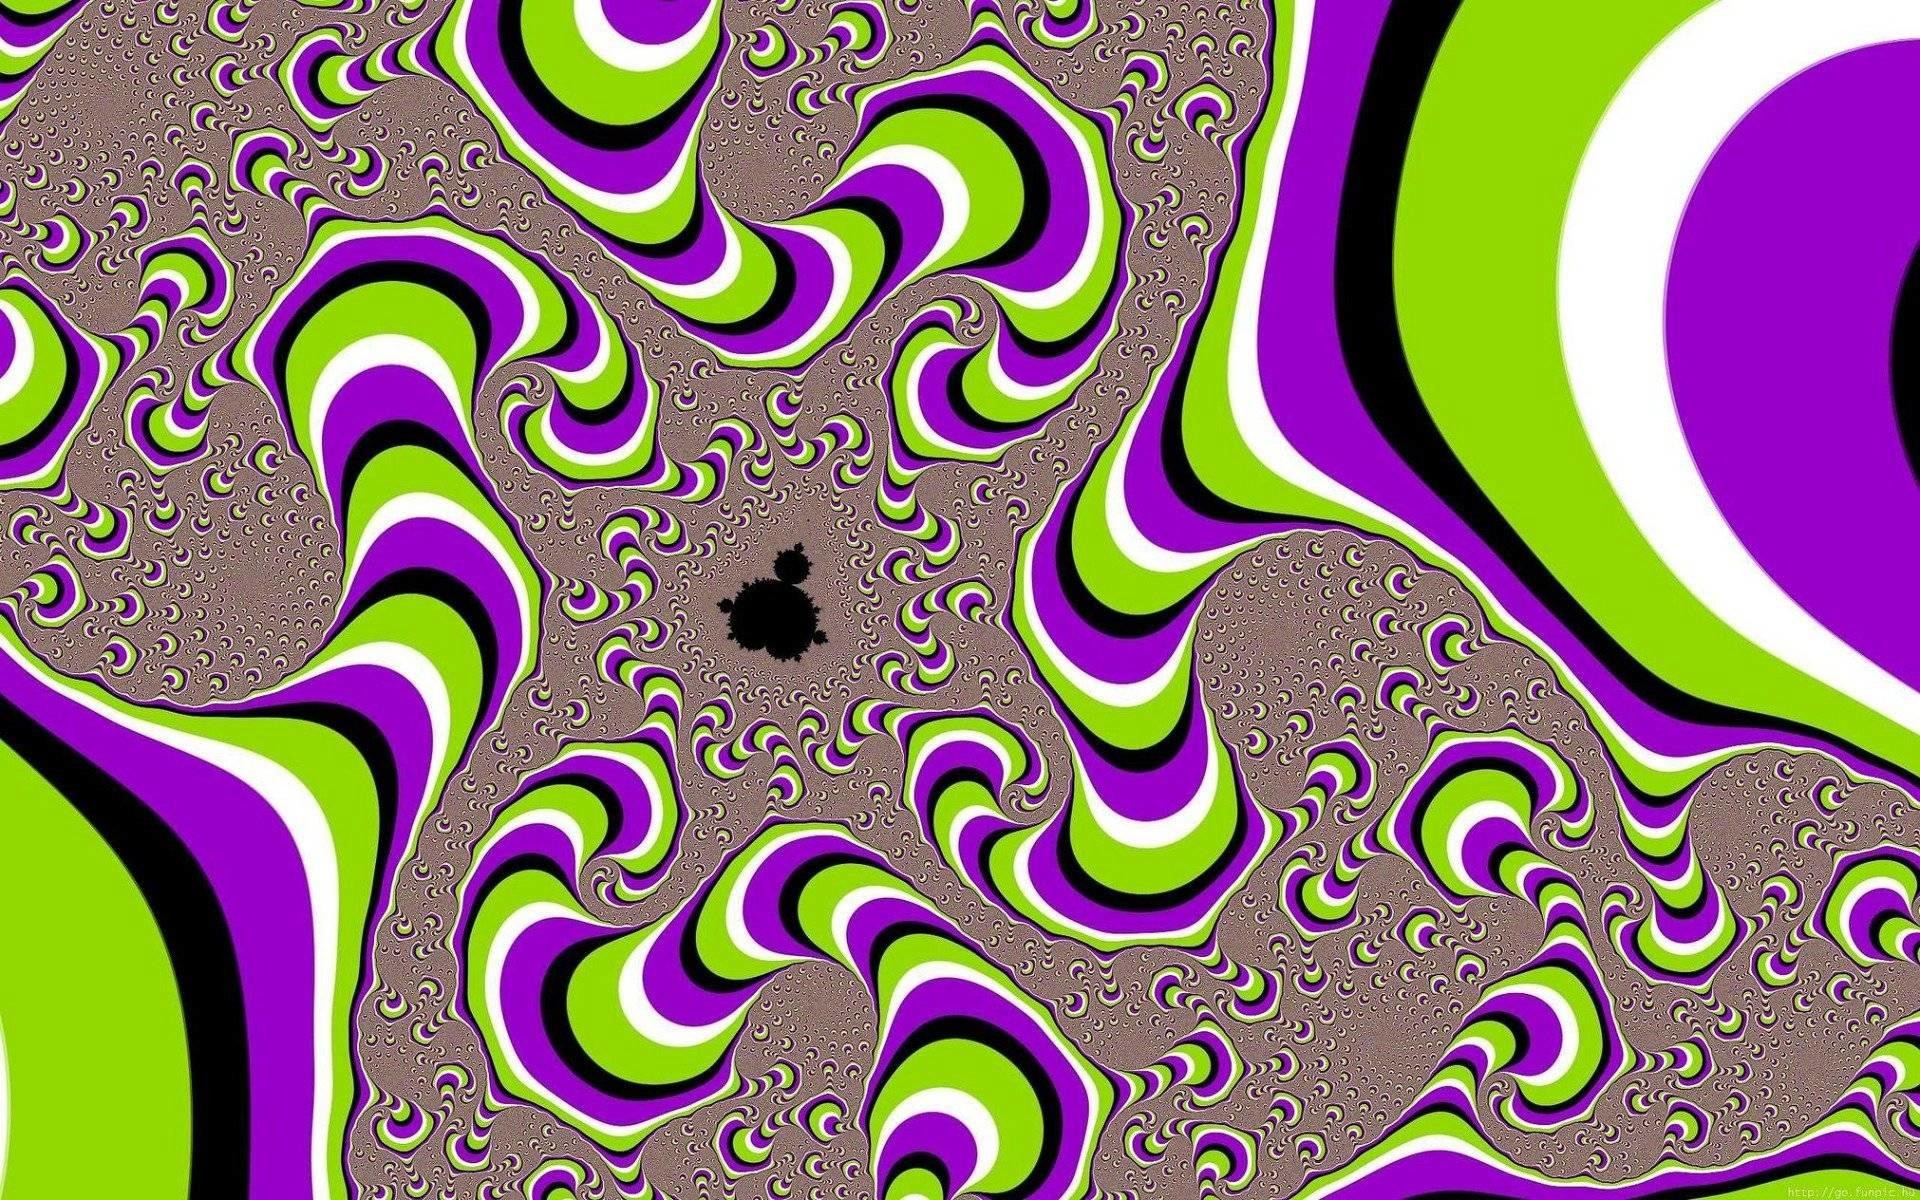 Res: 1920x1200, Shroom Wallpaper Epic Car Full Hd Trippy Acid For Laptop Pics